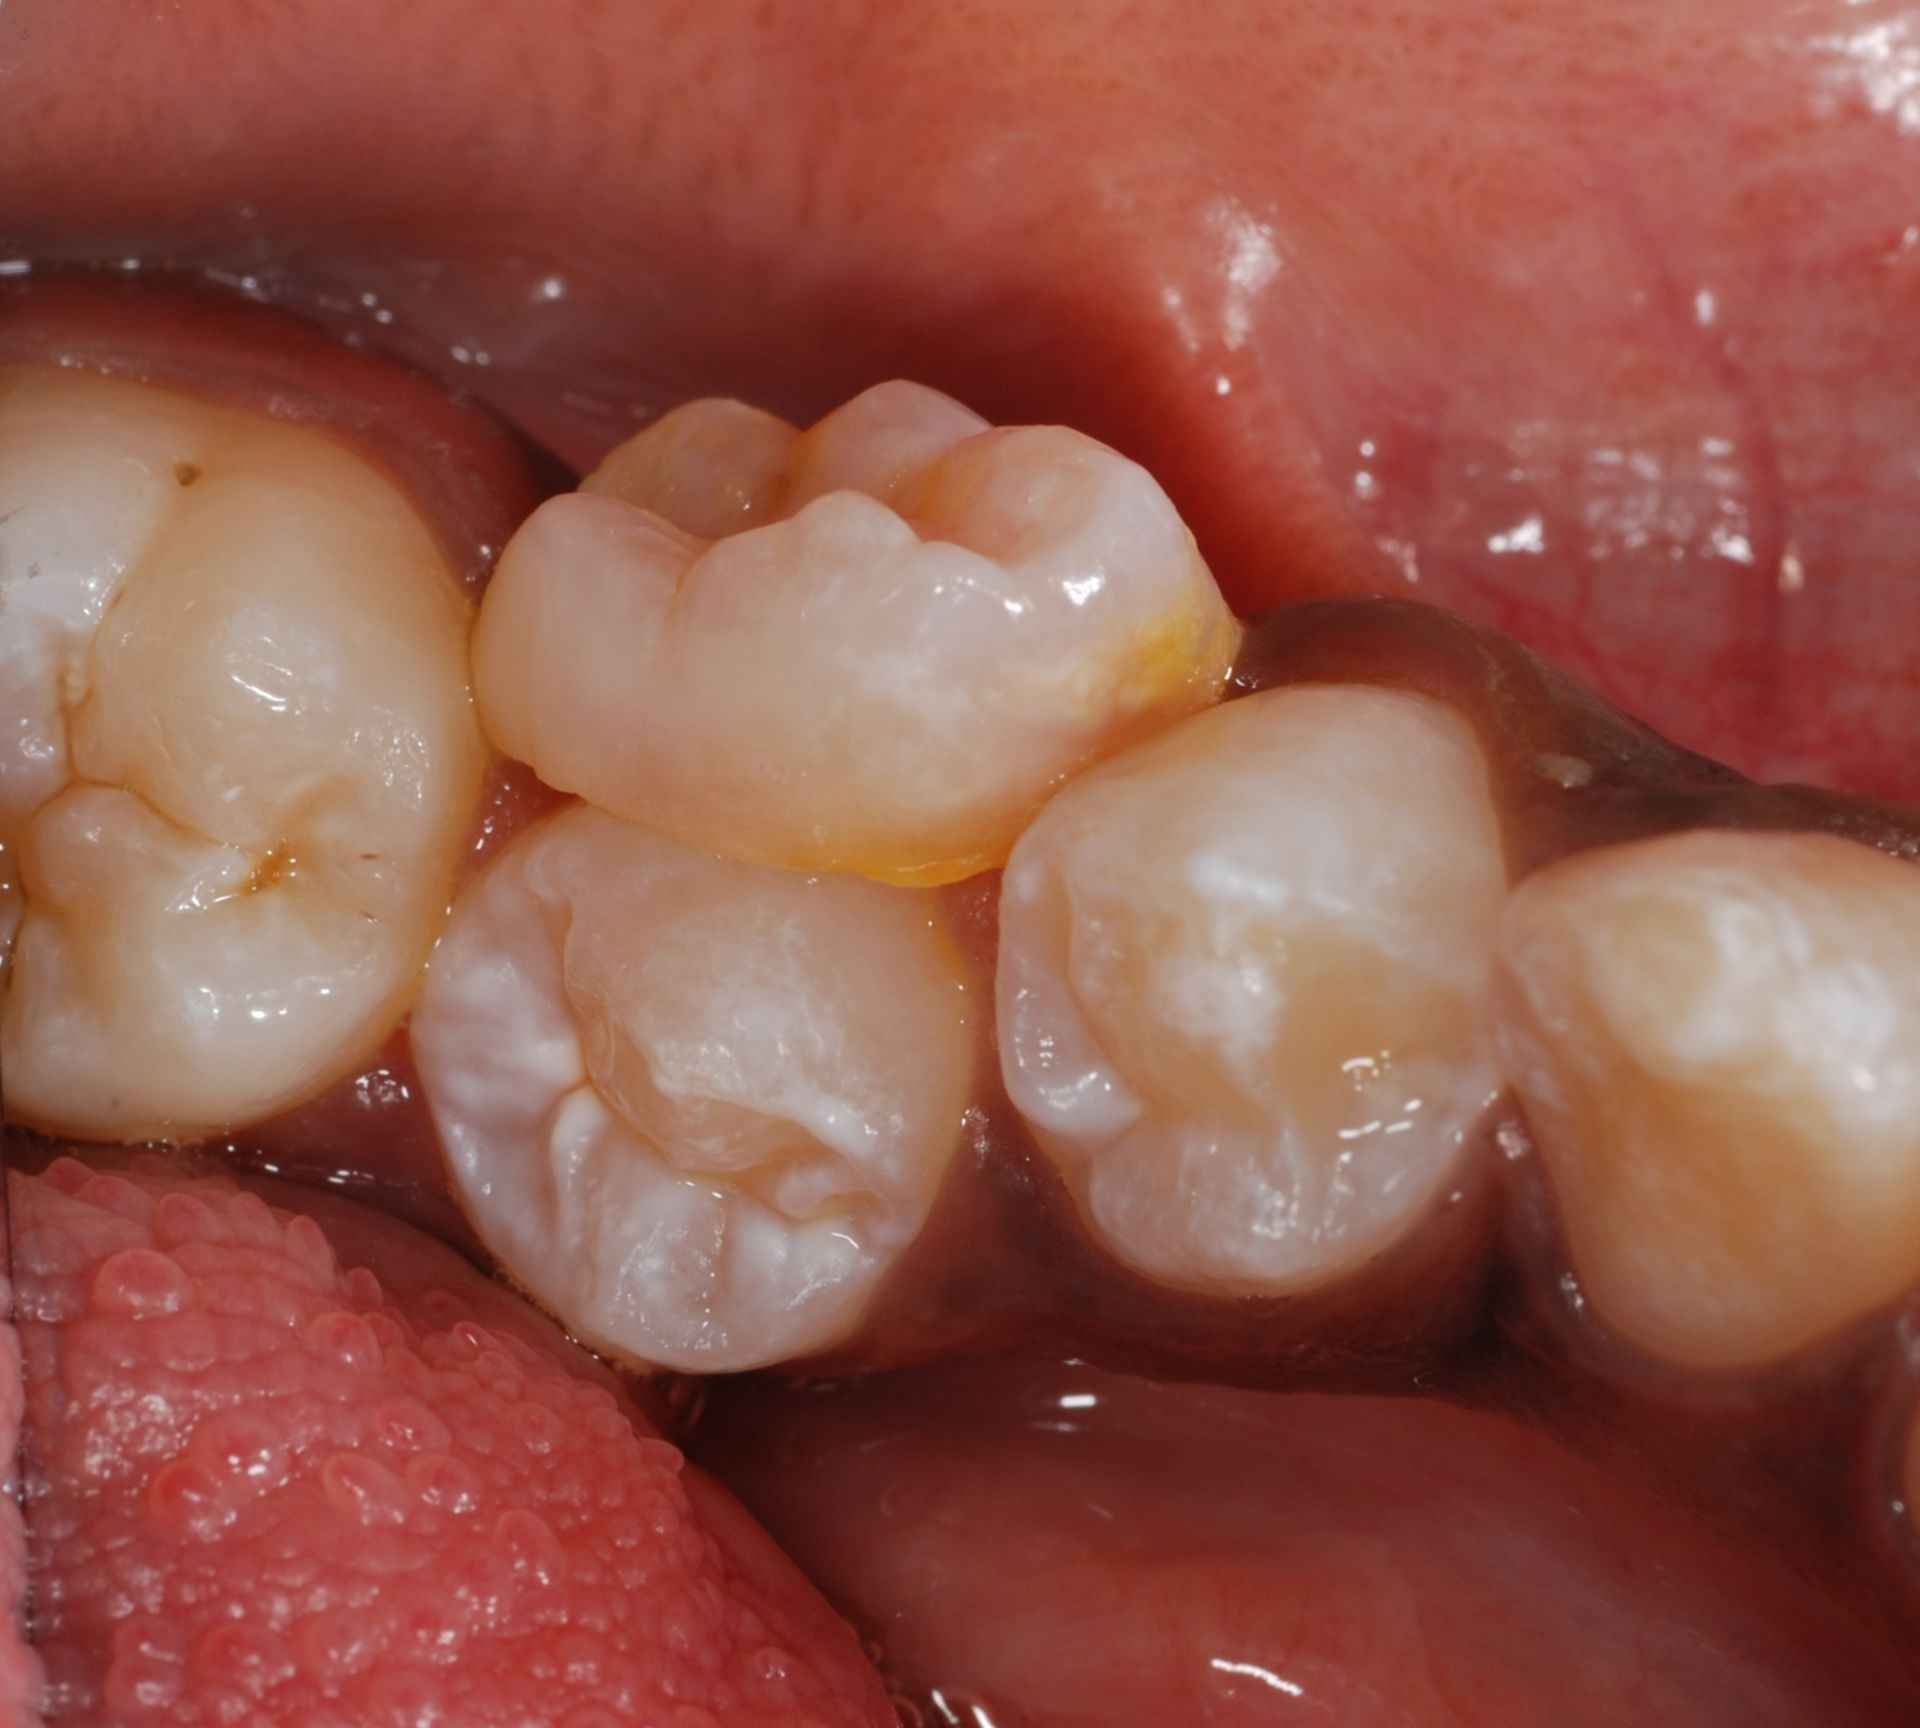 Persistent milk tooth 75